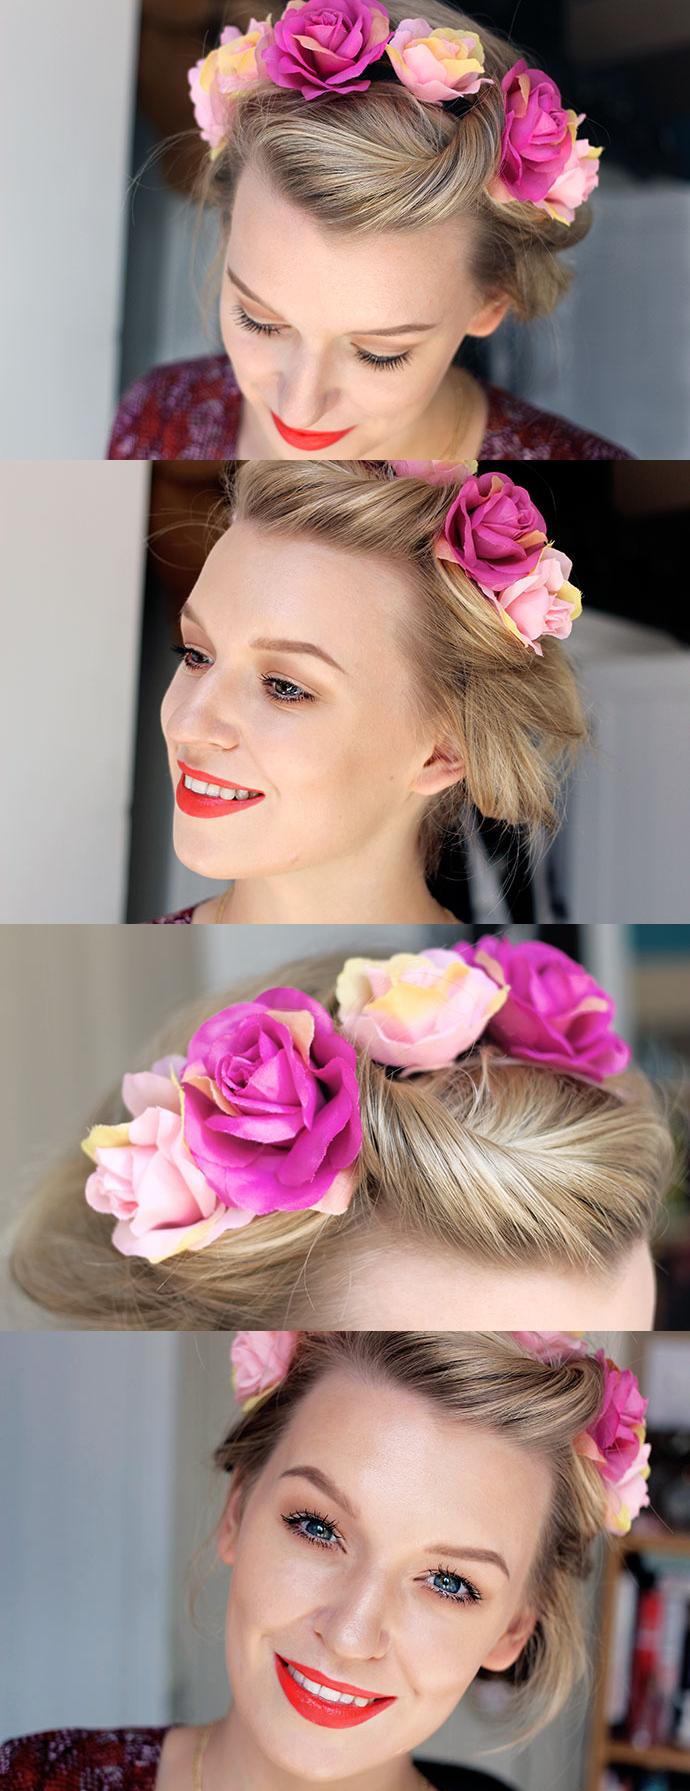 Summer Festival Fun with a Floral Headband on Short Blonde Hair.